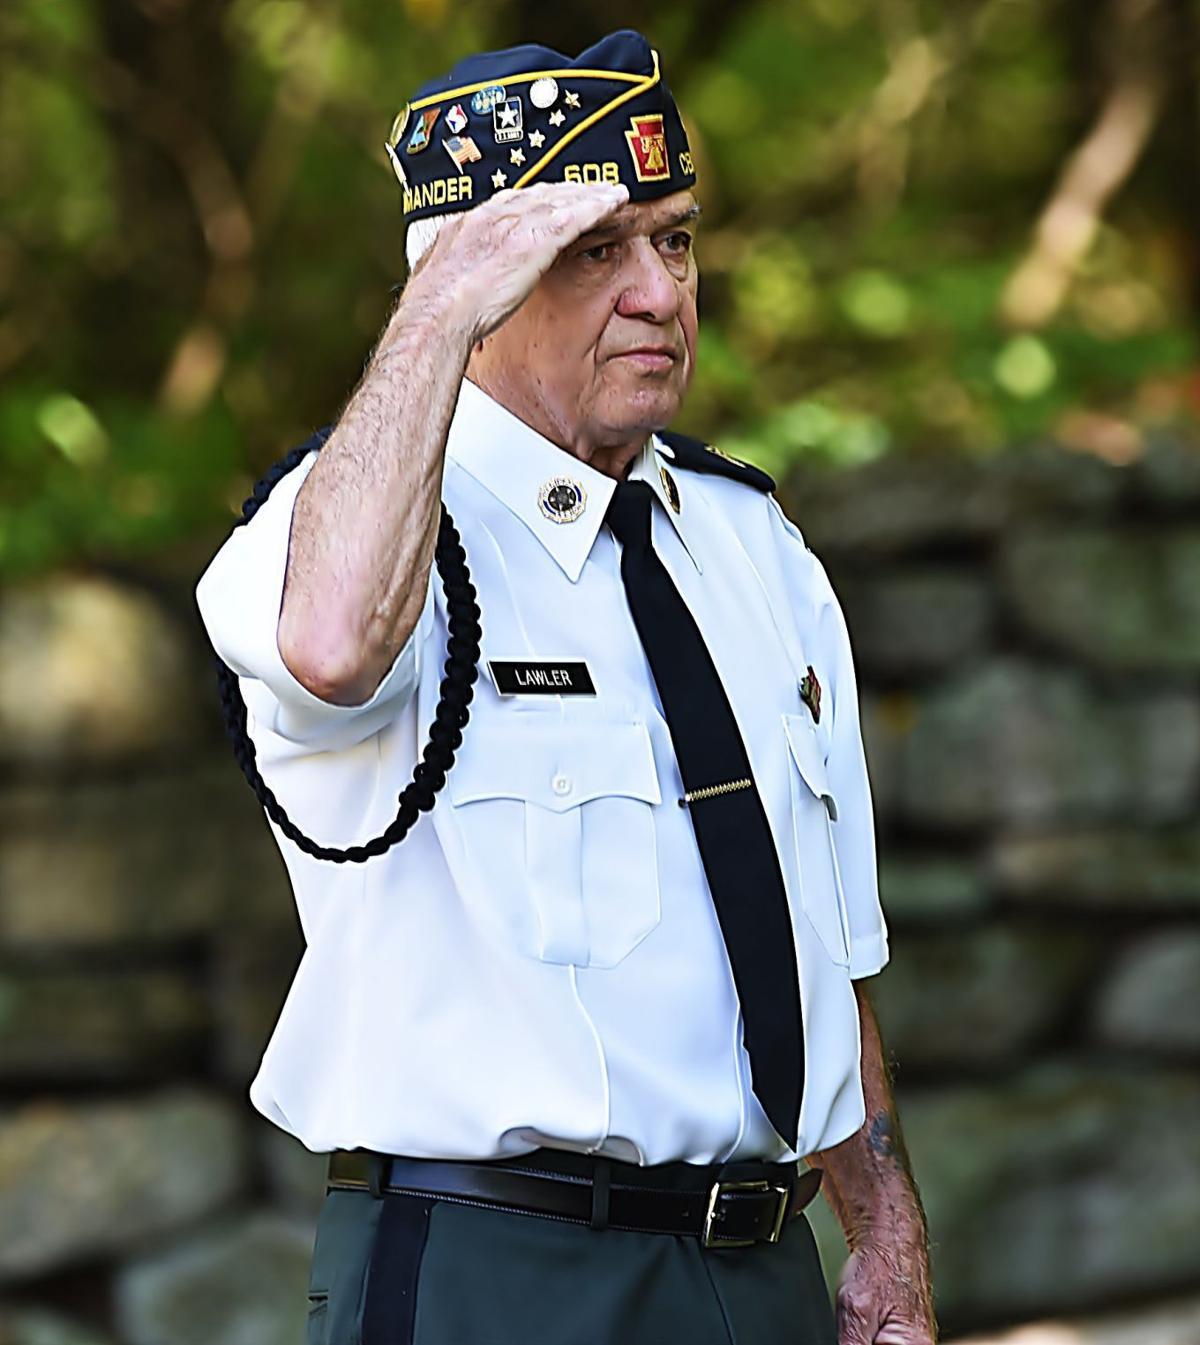 Post commander salute